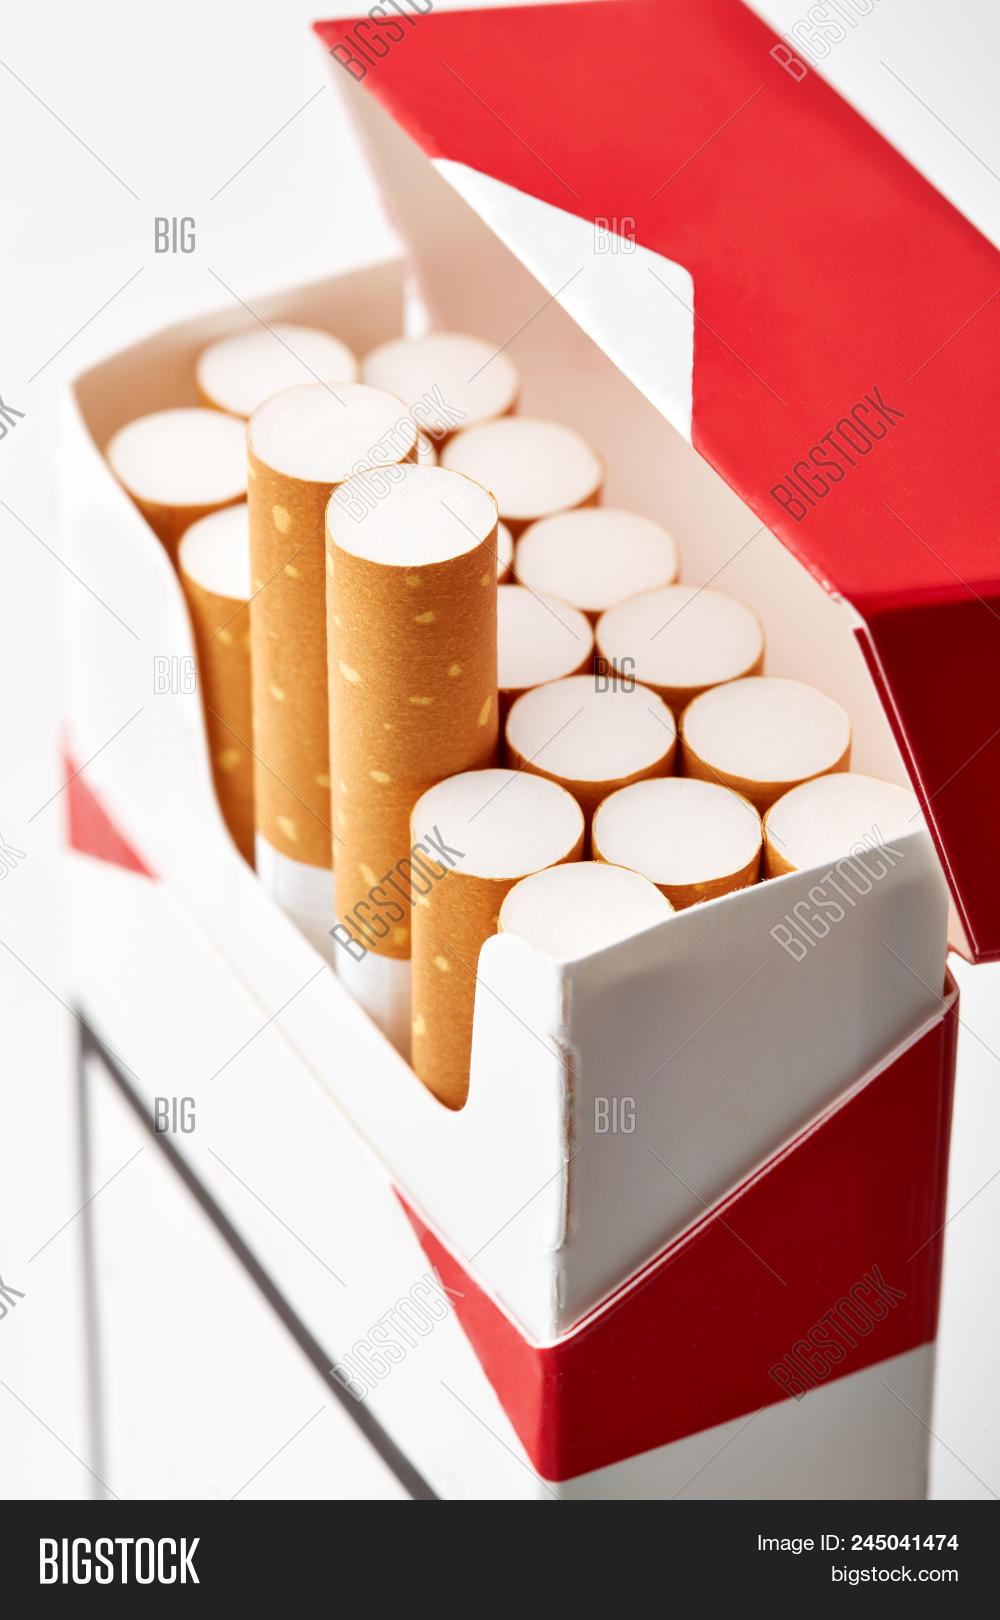 Cigarettes Pack Close Image & Photo (Free Trial) | Bigstock